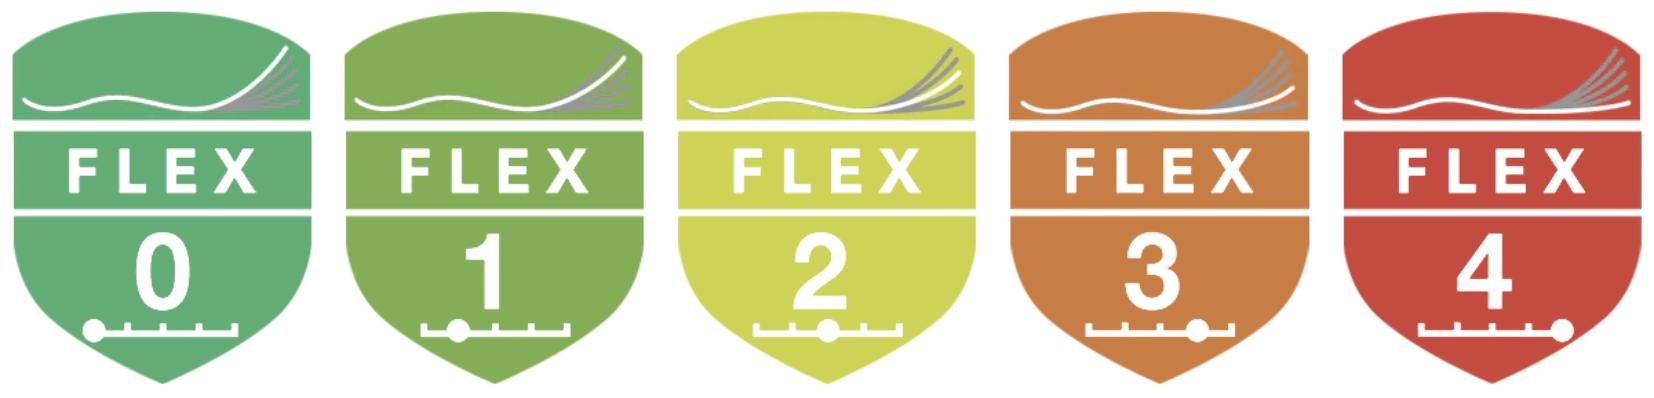 flex-scale-sumbols.png